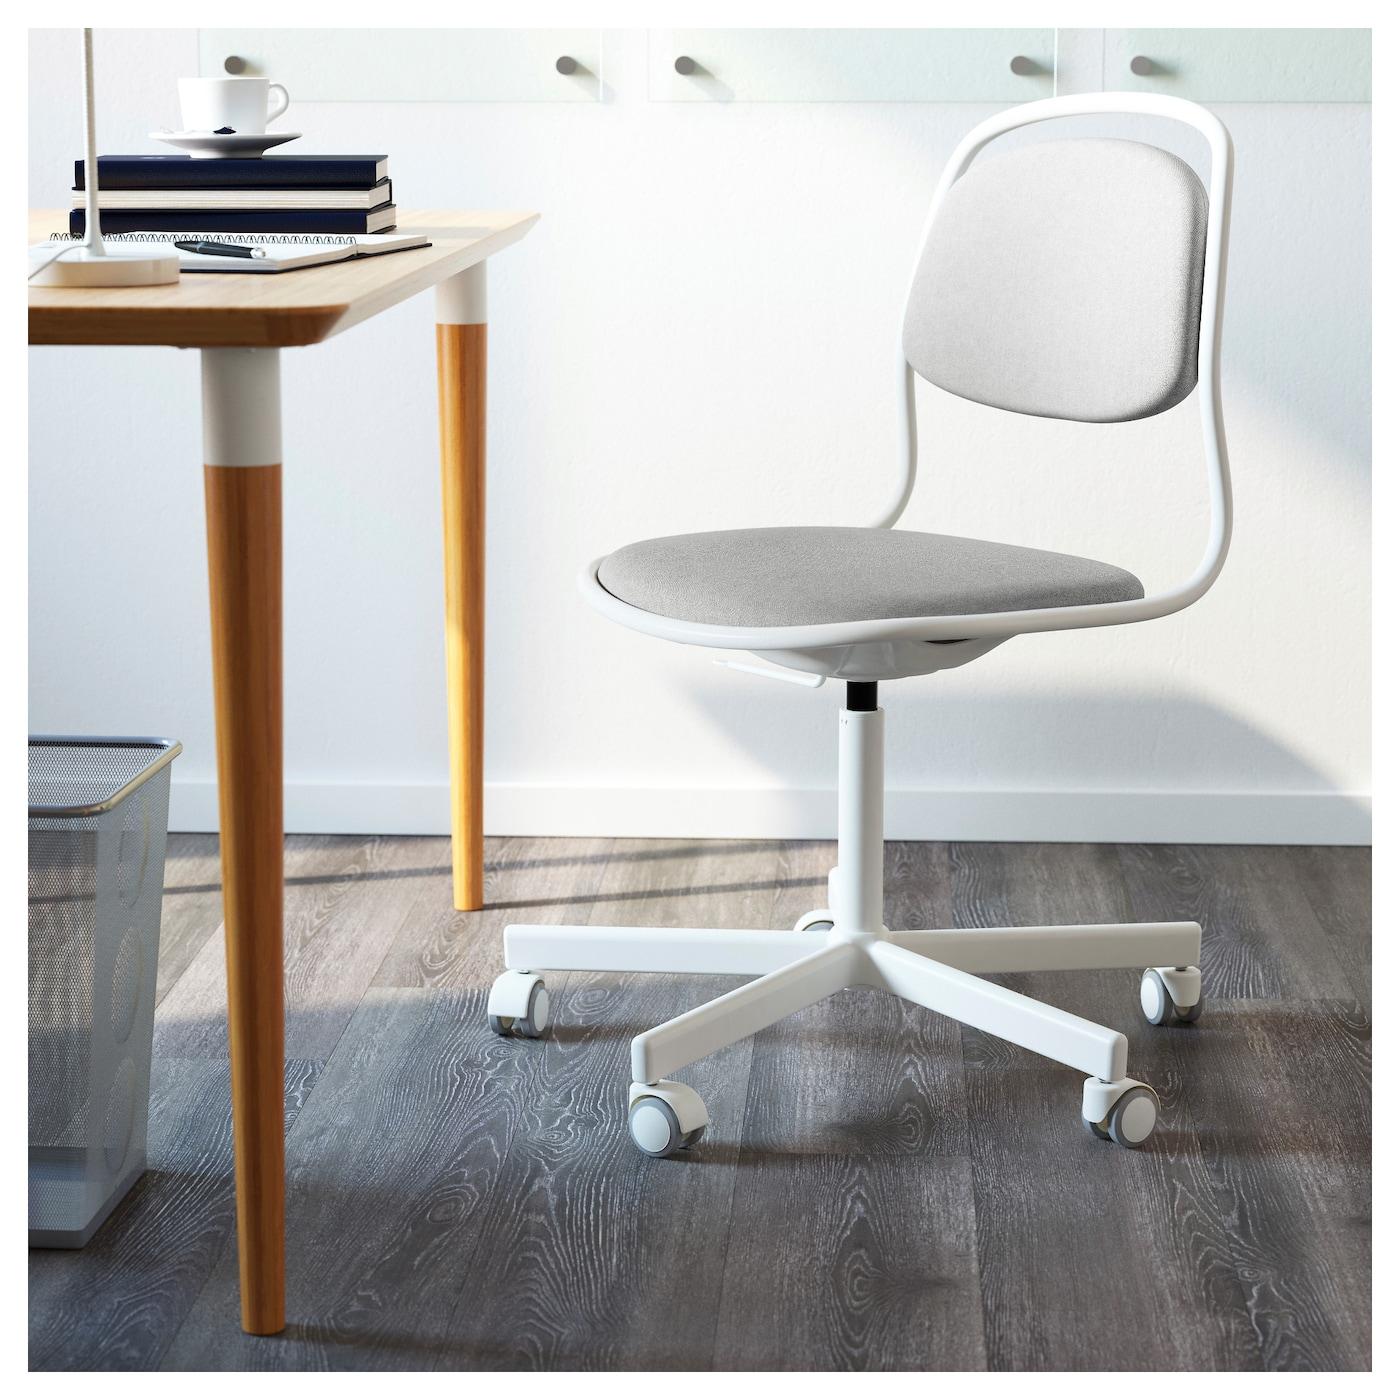 Rfj ll sporren silla giratoria blanco vissle gris claro - Sillas trabajo ikea ...